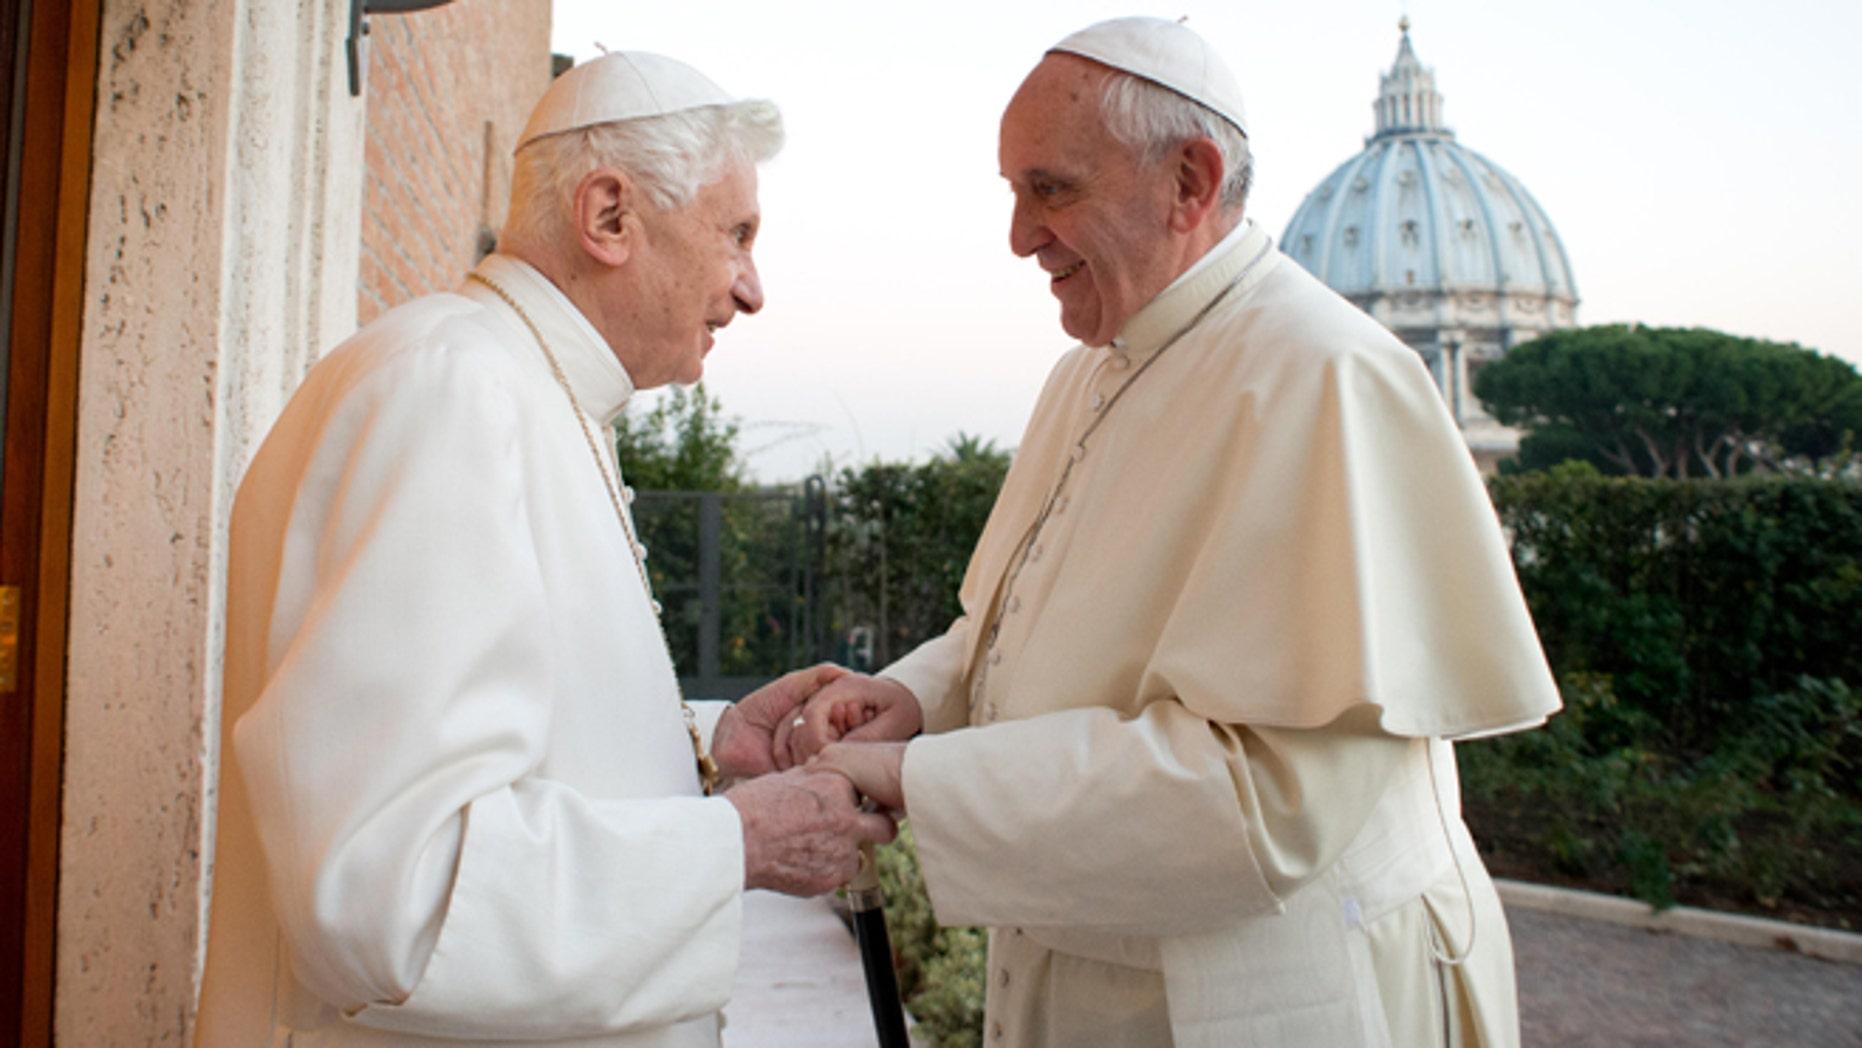 Pope Emeritus Benedict XVI and Pope Francis exchange Christmas greetings on Dec. 23, 2013.